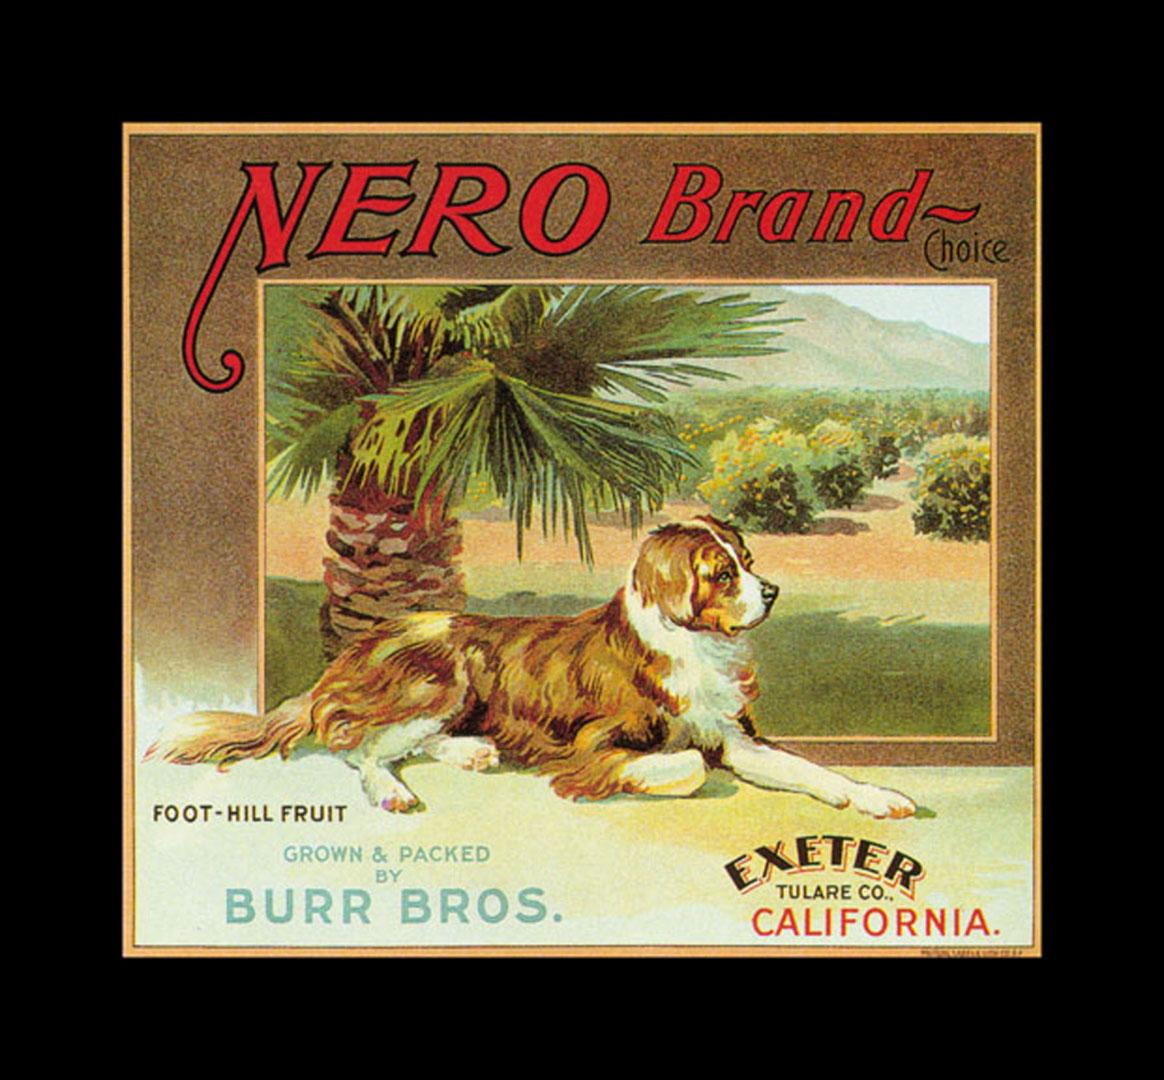 Nero Brand Oranges   Vintage Fruit Crate Labels Wallpaper Image 1164x1080